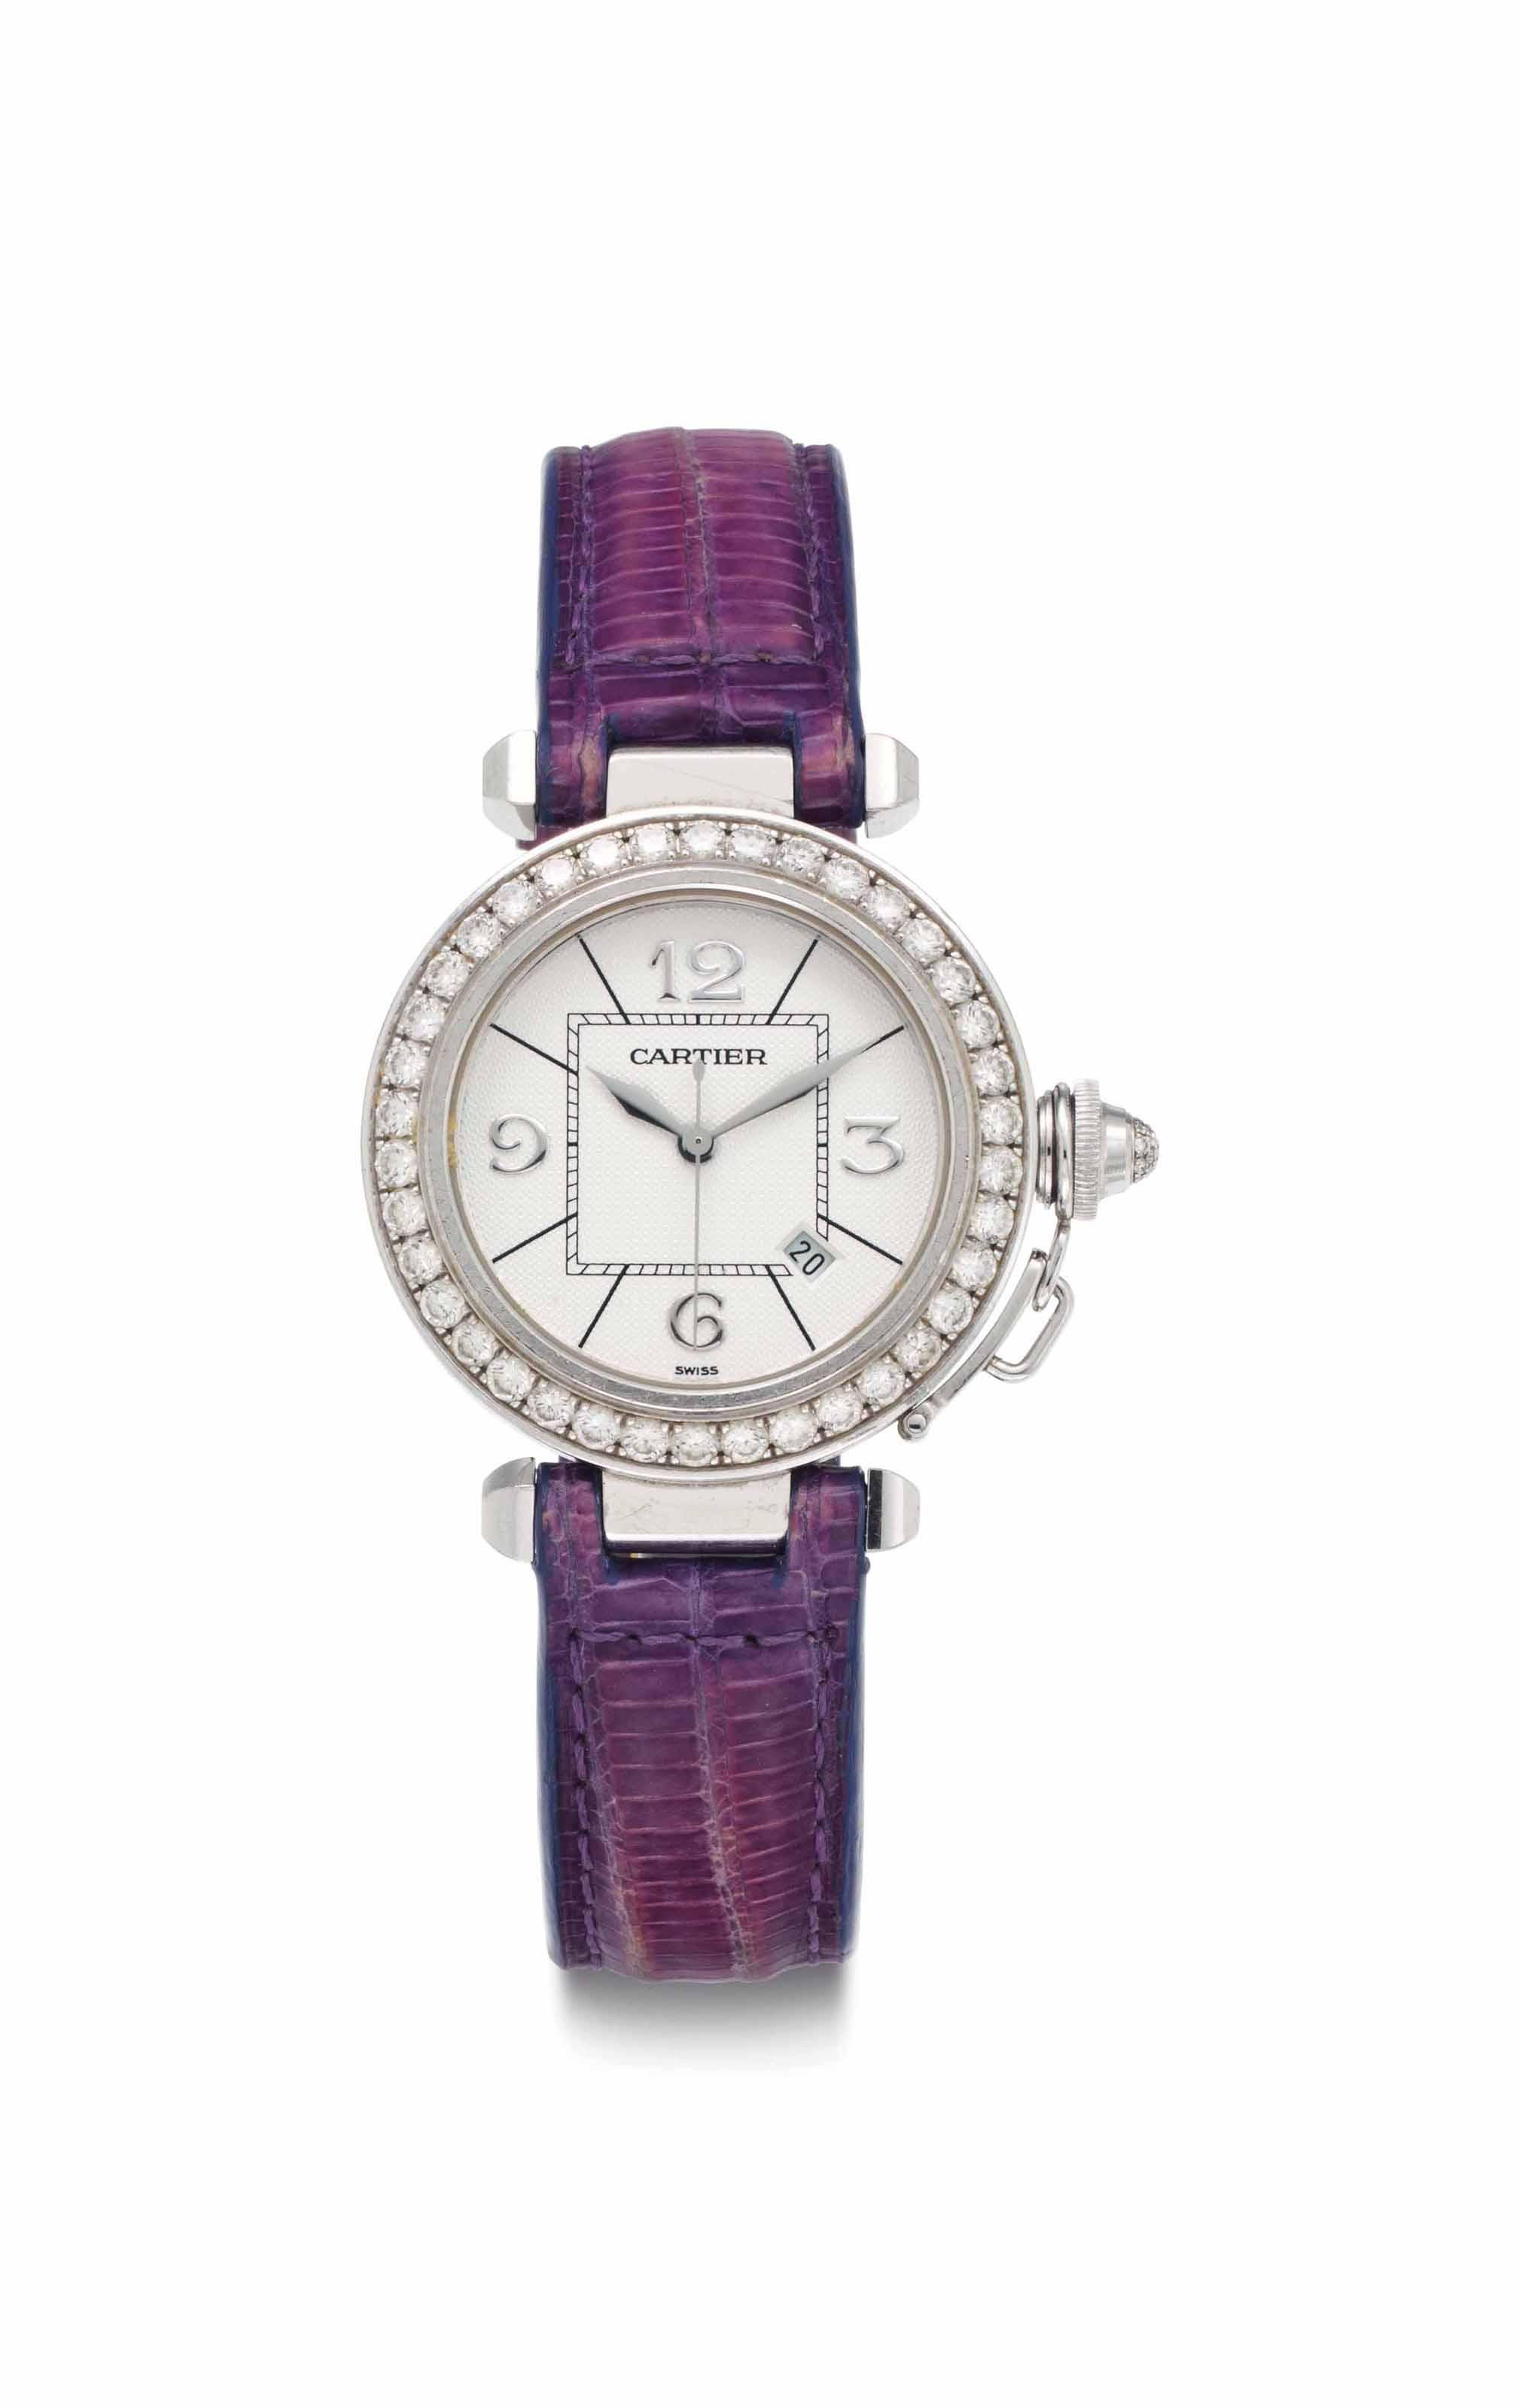 Cartier. A Lady's 18k White Go